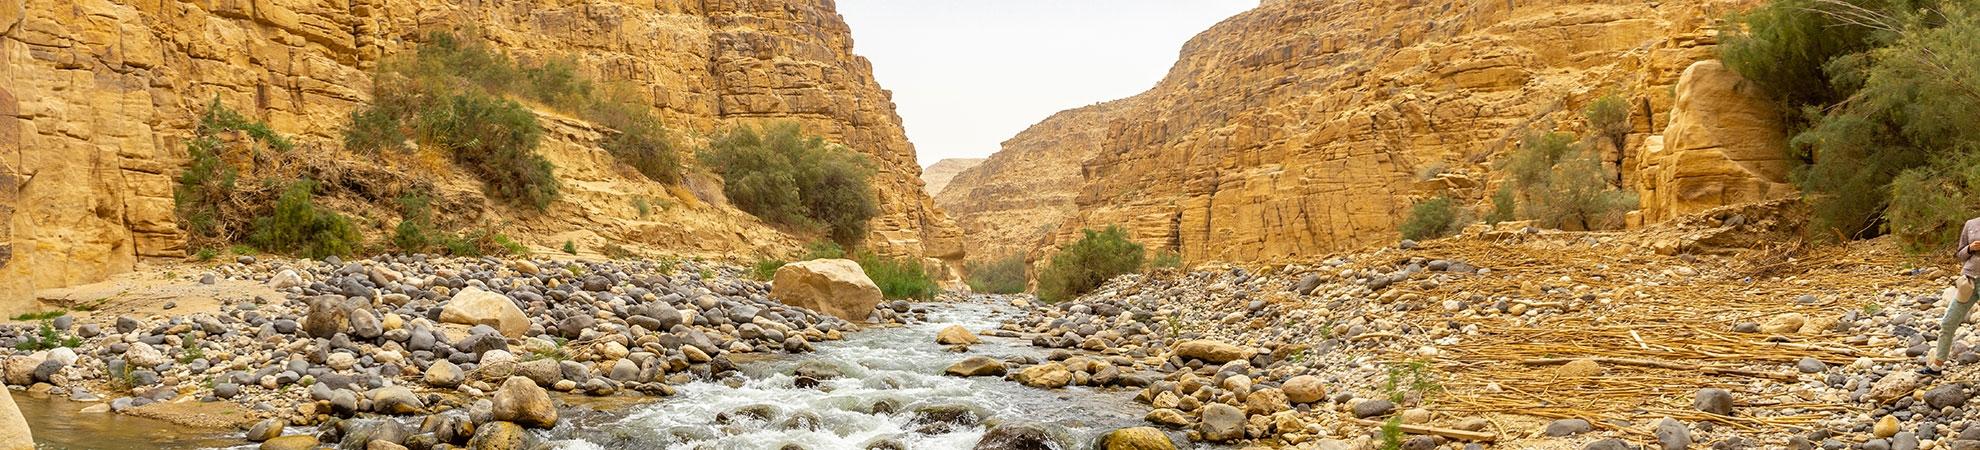 Voyage Réserve d'Al Mujib